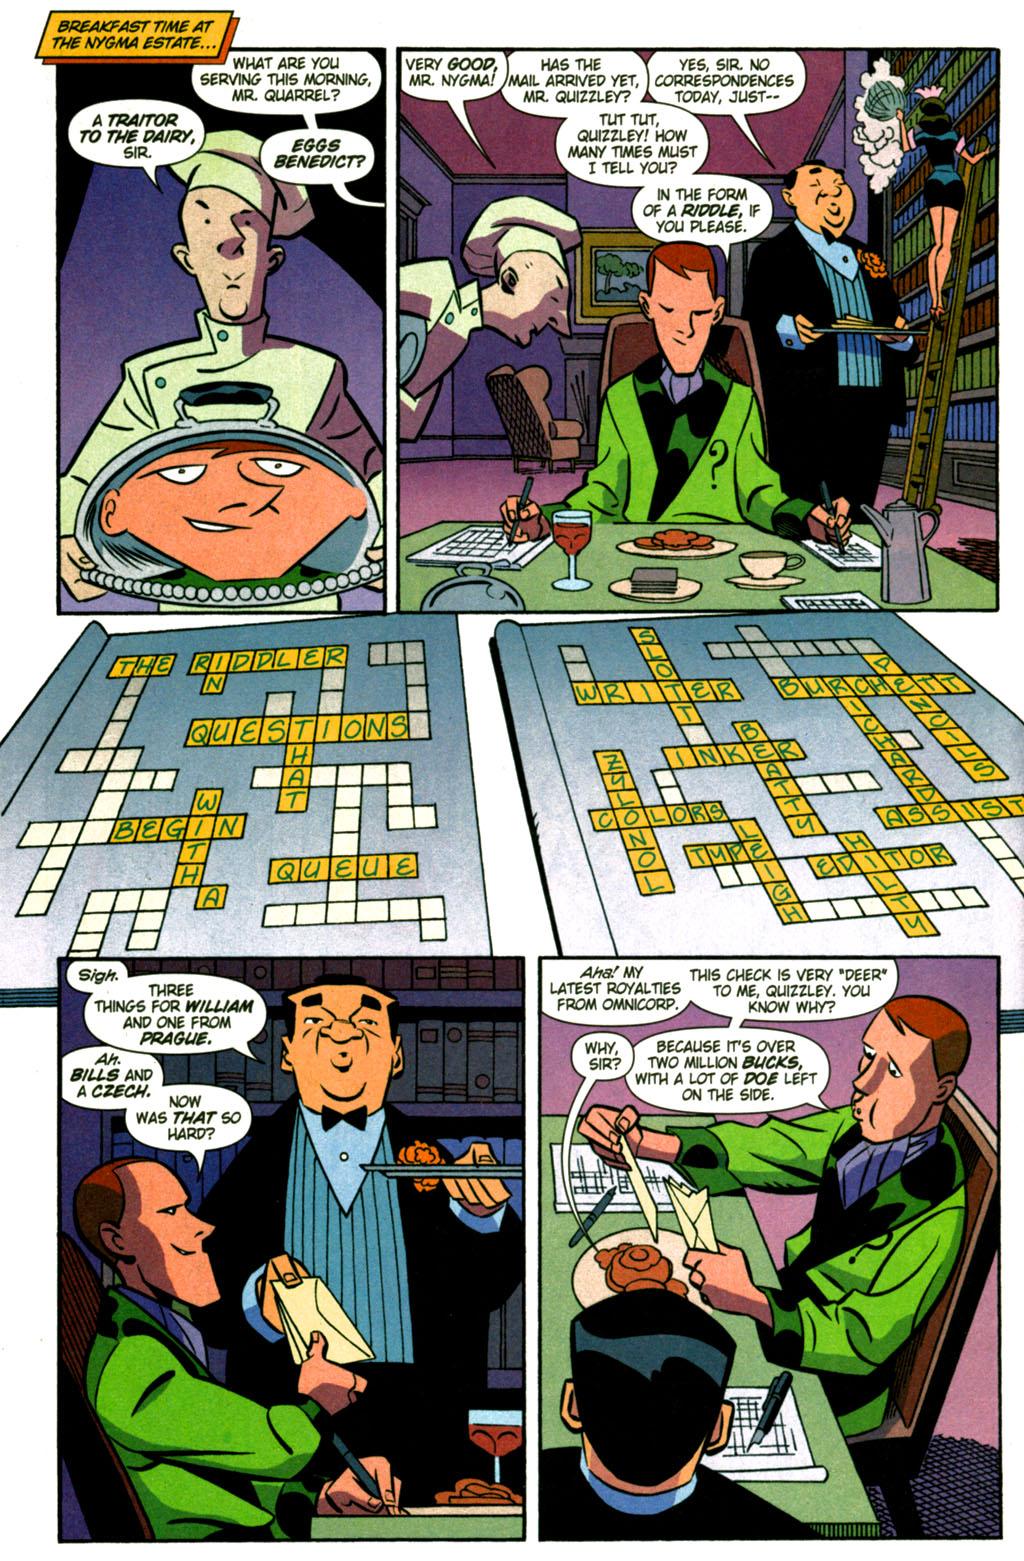 read online batman adventures 2003 comic issue 11. Black Bedroom Furniture Sets. Home Design Ideas